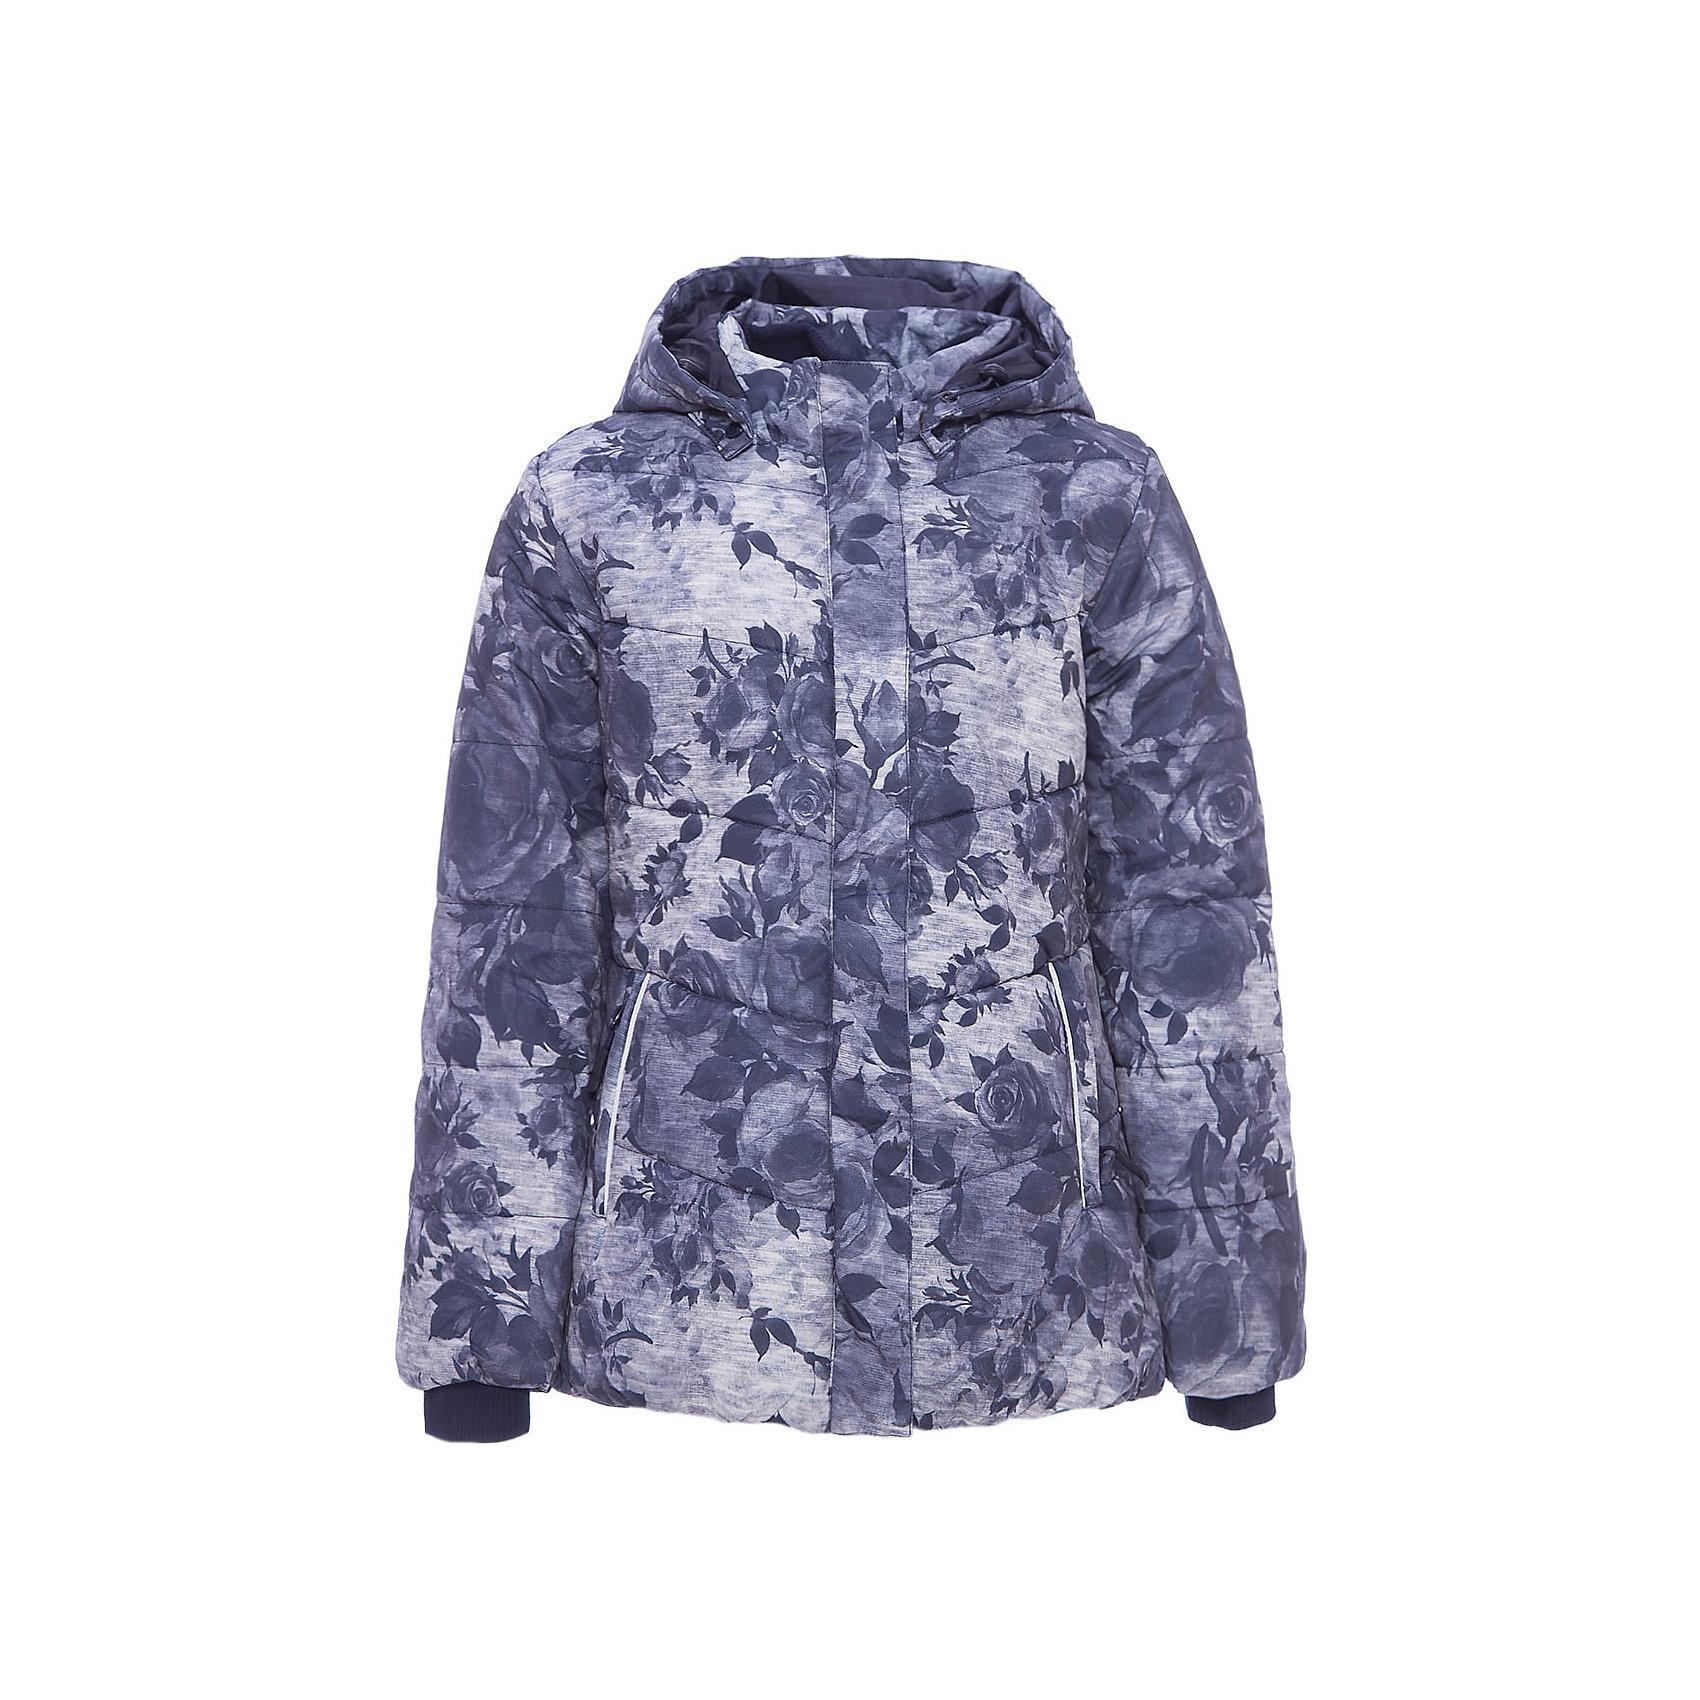 S'cool Куртка для девочки S'cool